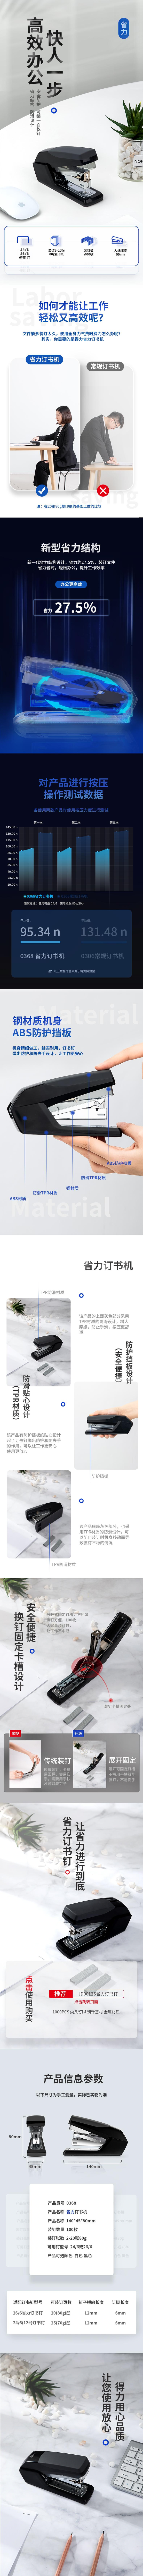 VWIN真人0368省力订书机(黑色)